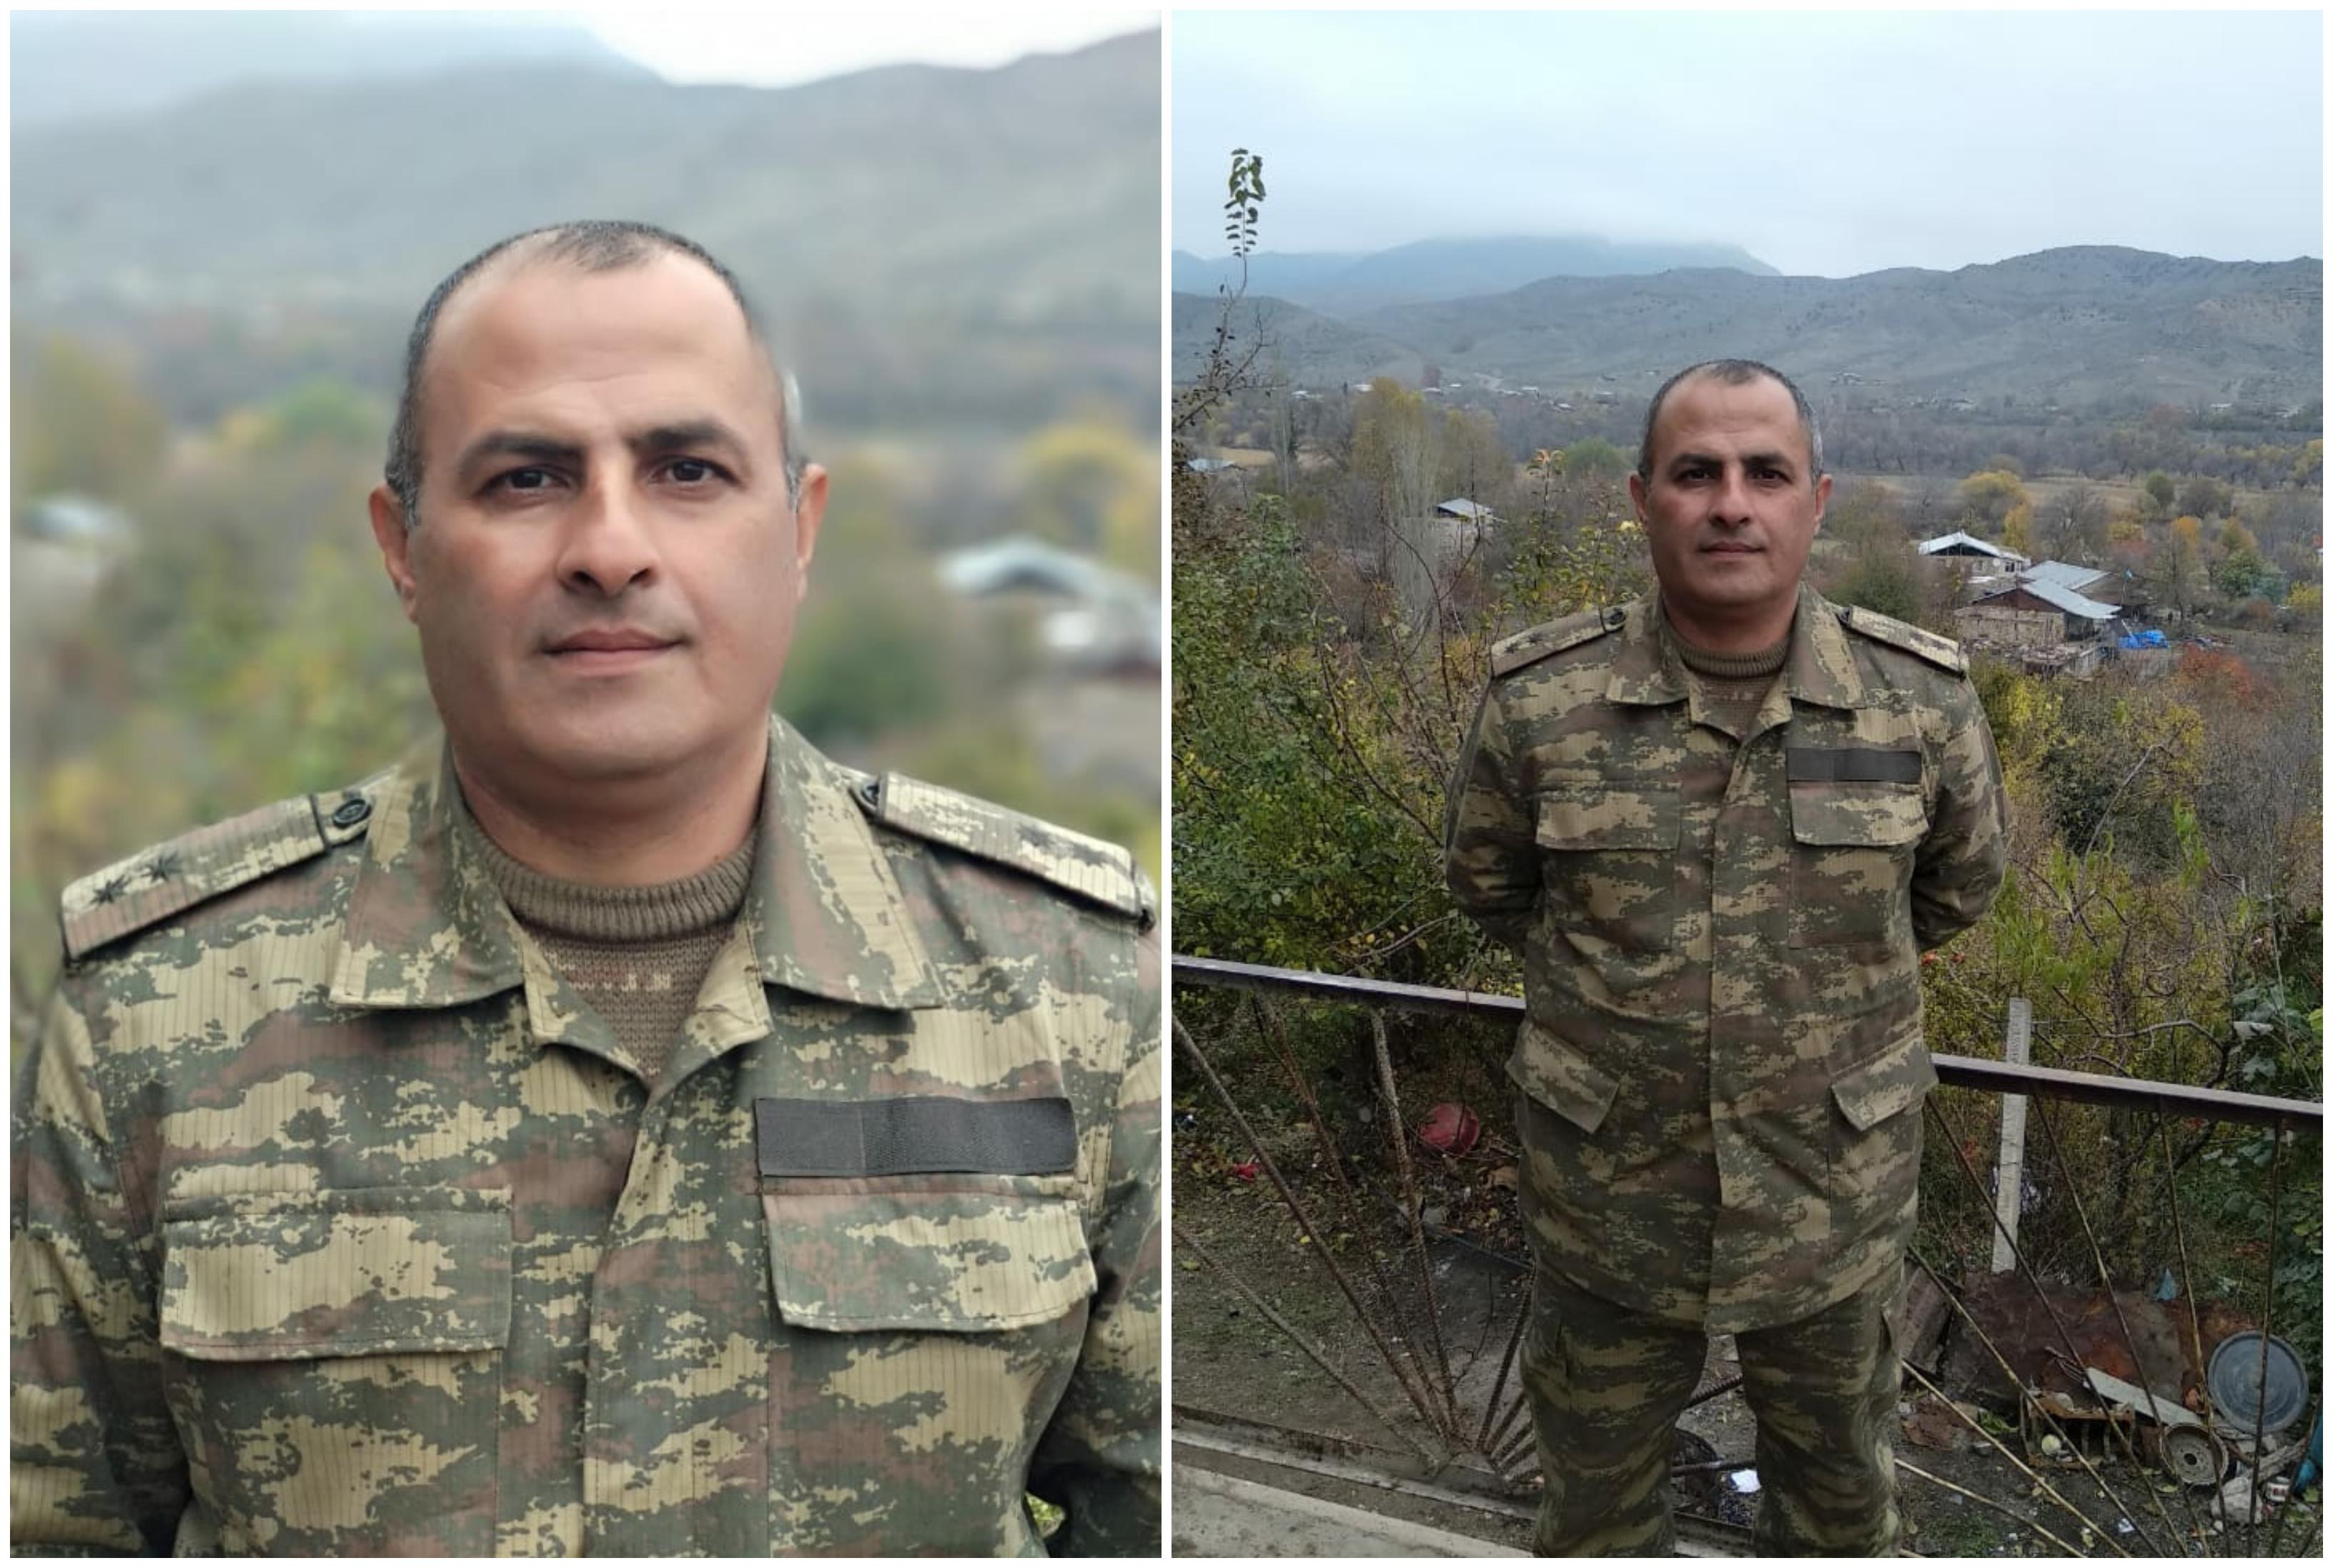 Qulu Allahverdiyev